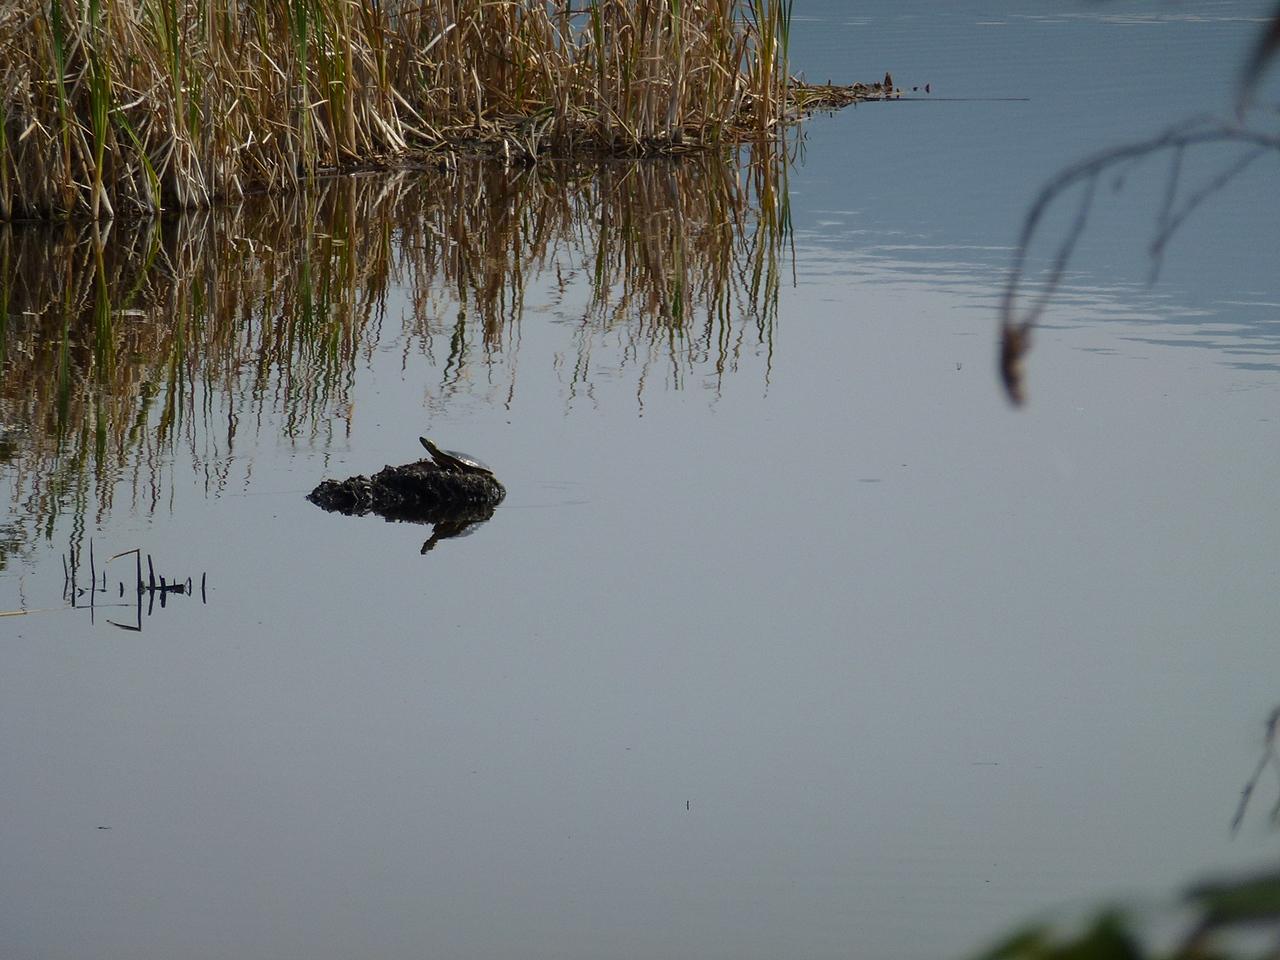 Turtle breeding lake before Canada border.